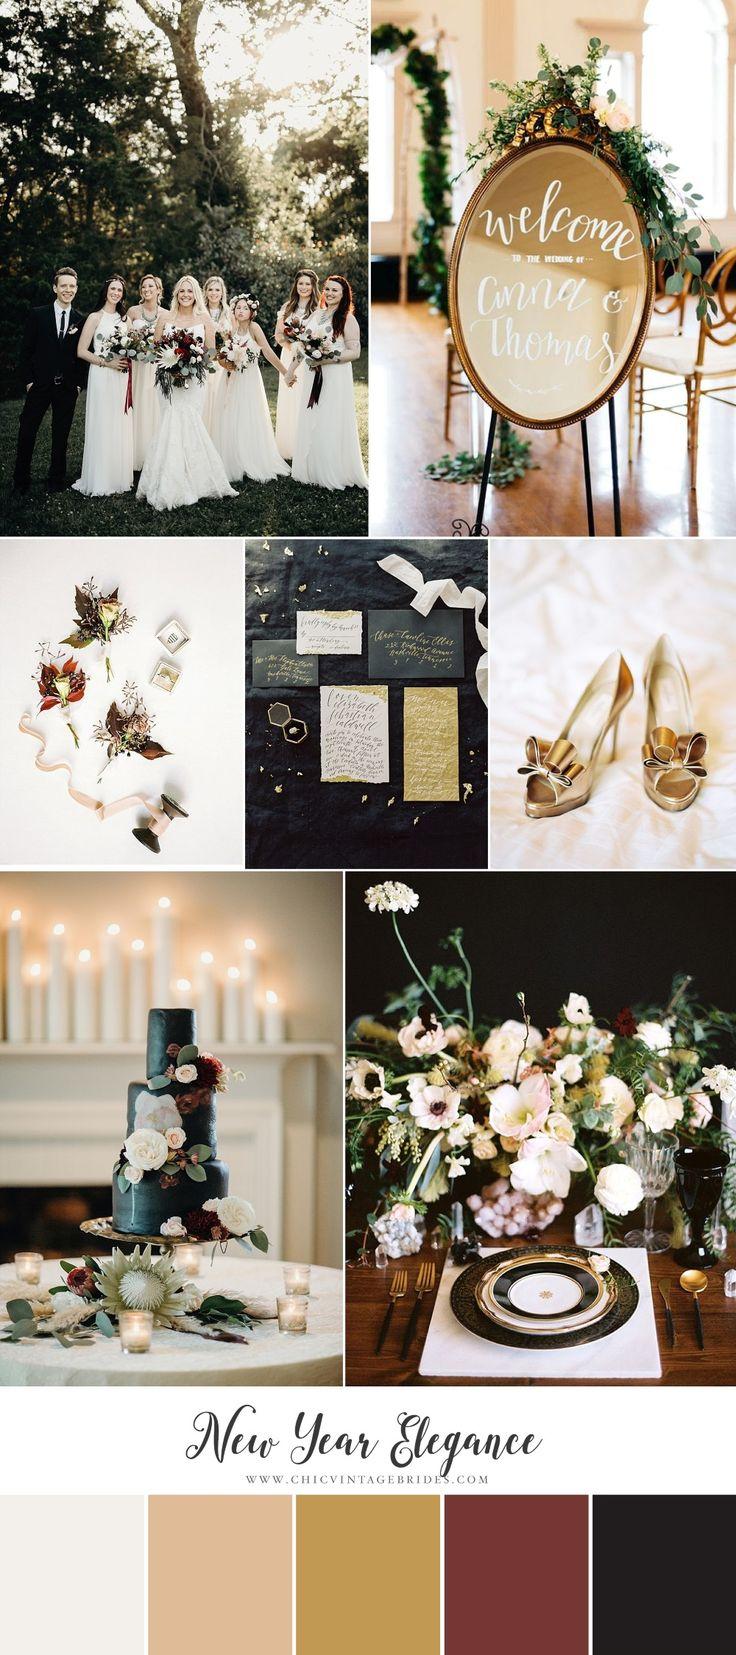 New Year Elegance - Stylish Wedding Inspiration in Ivory, Garnet & Gold